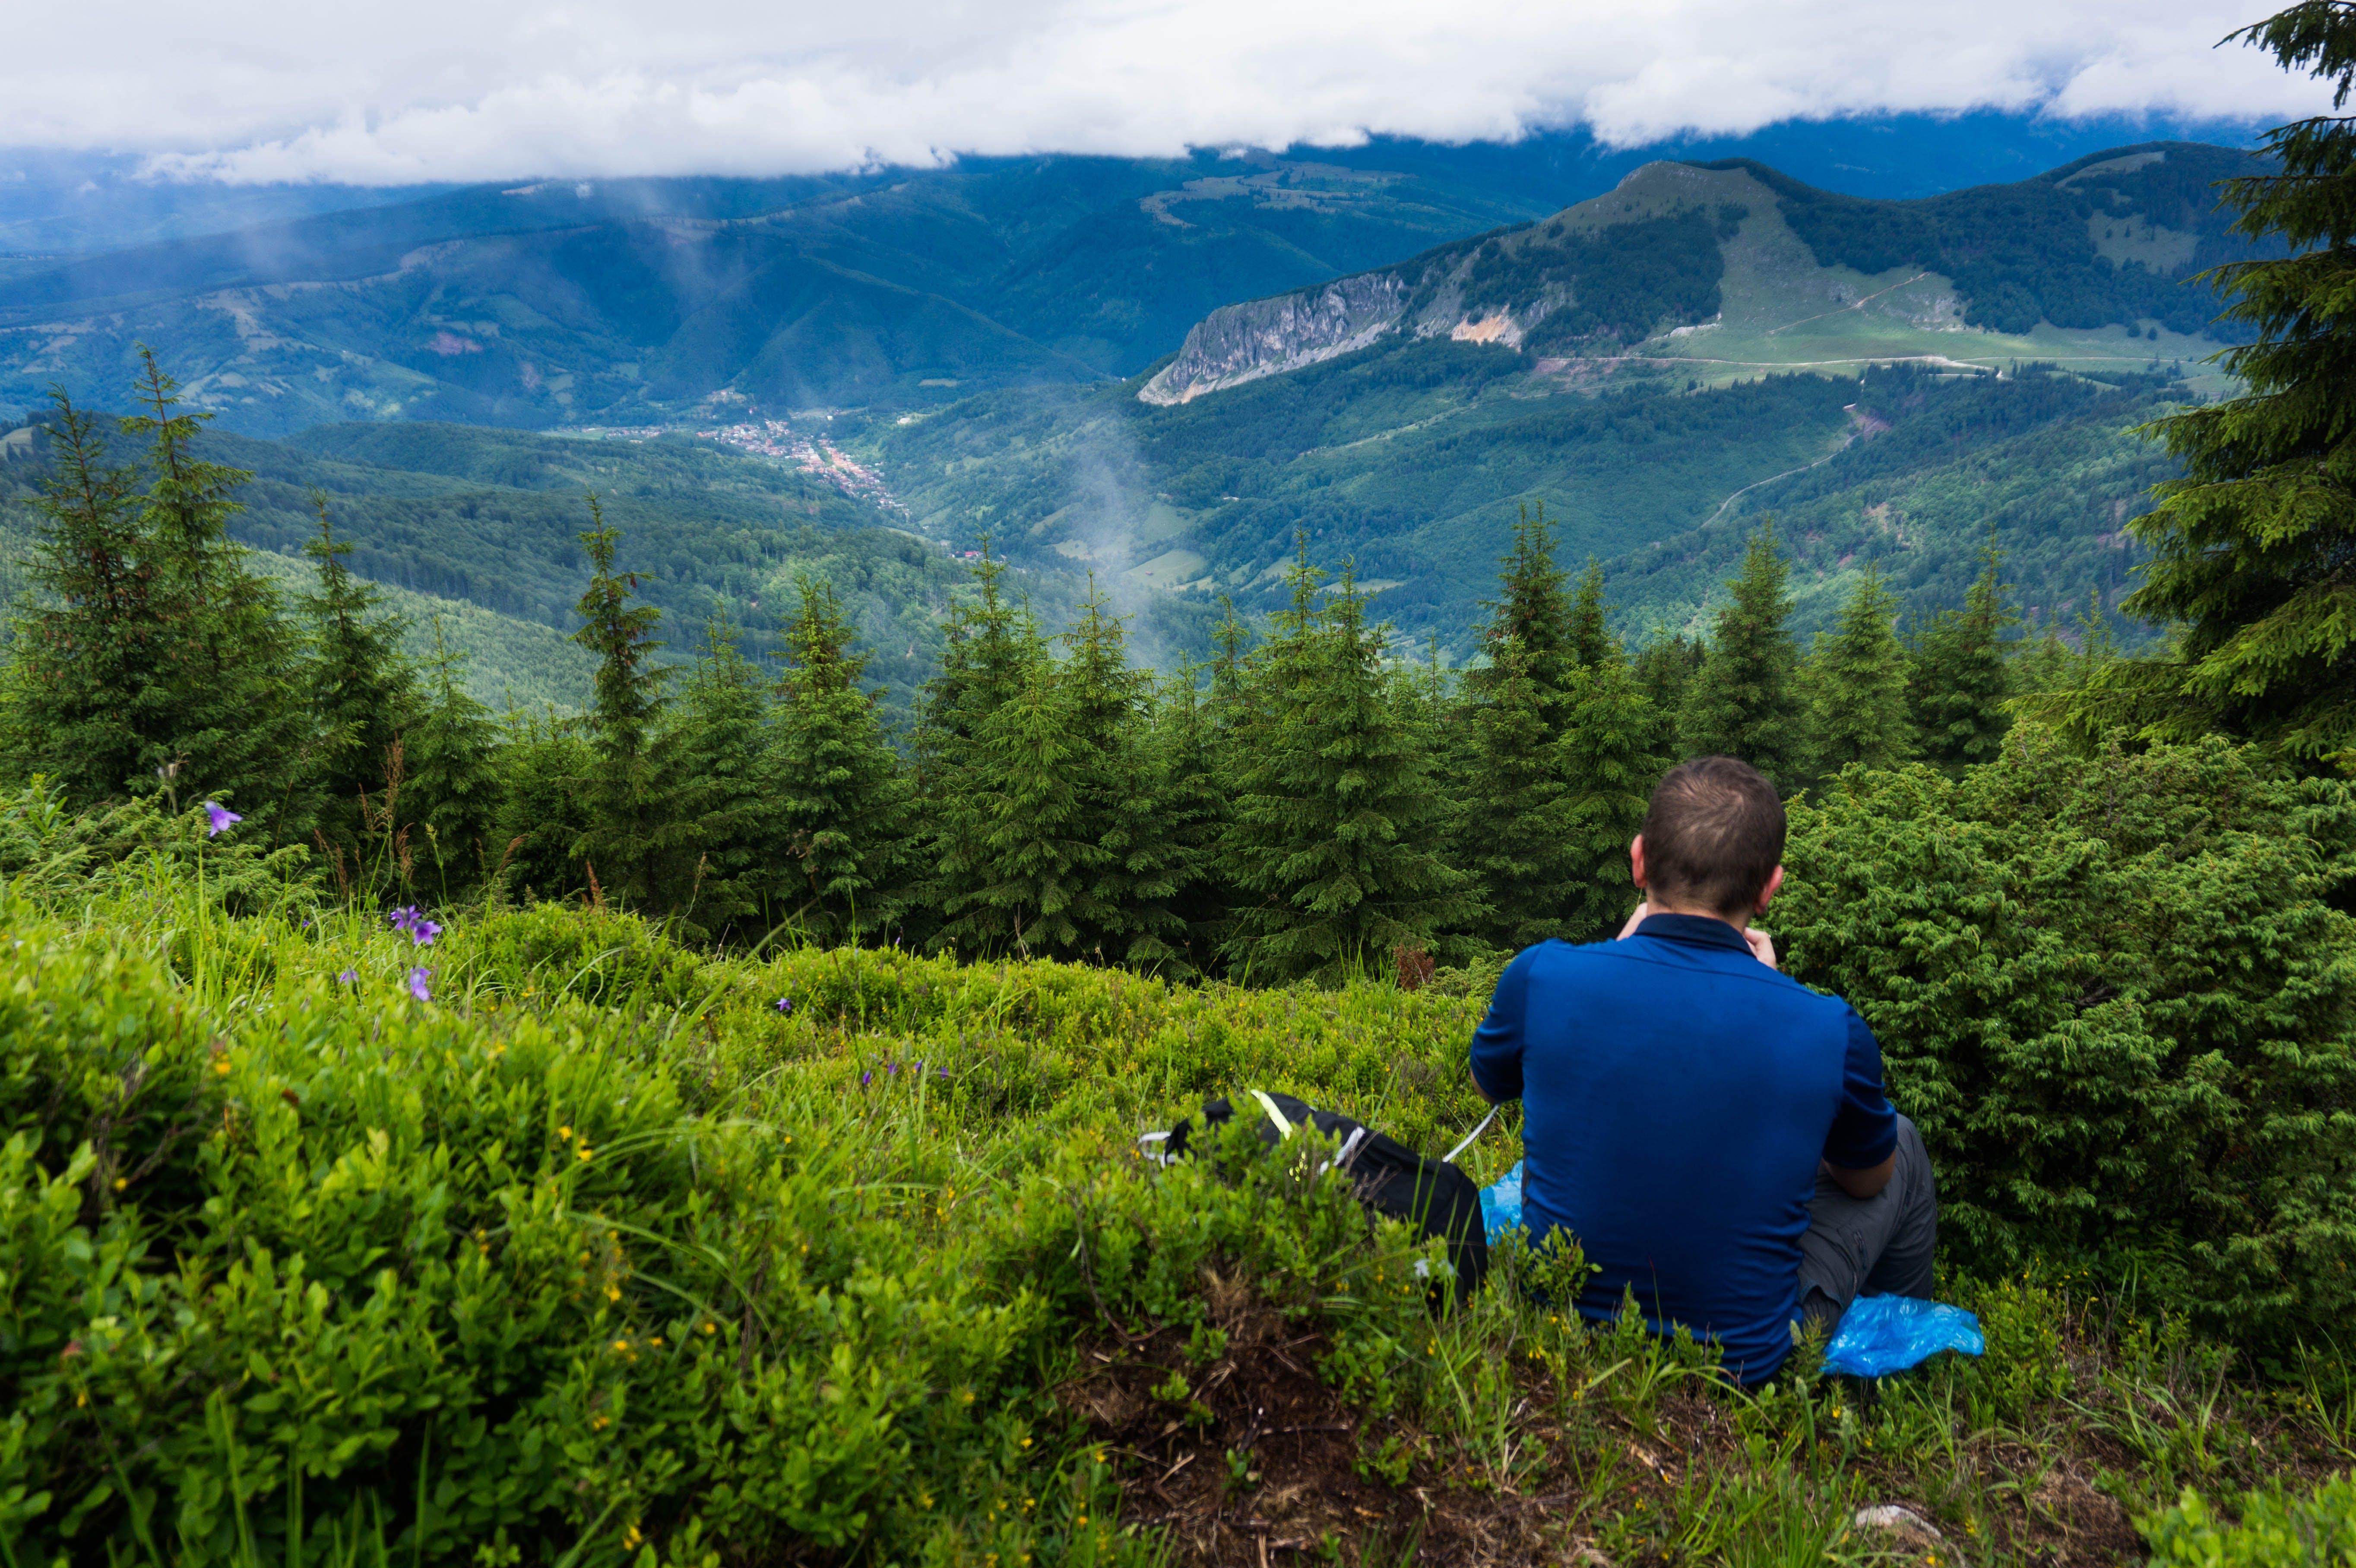 Man Wearing Blue Shirt Sitting On Green Grass